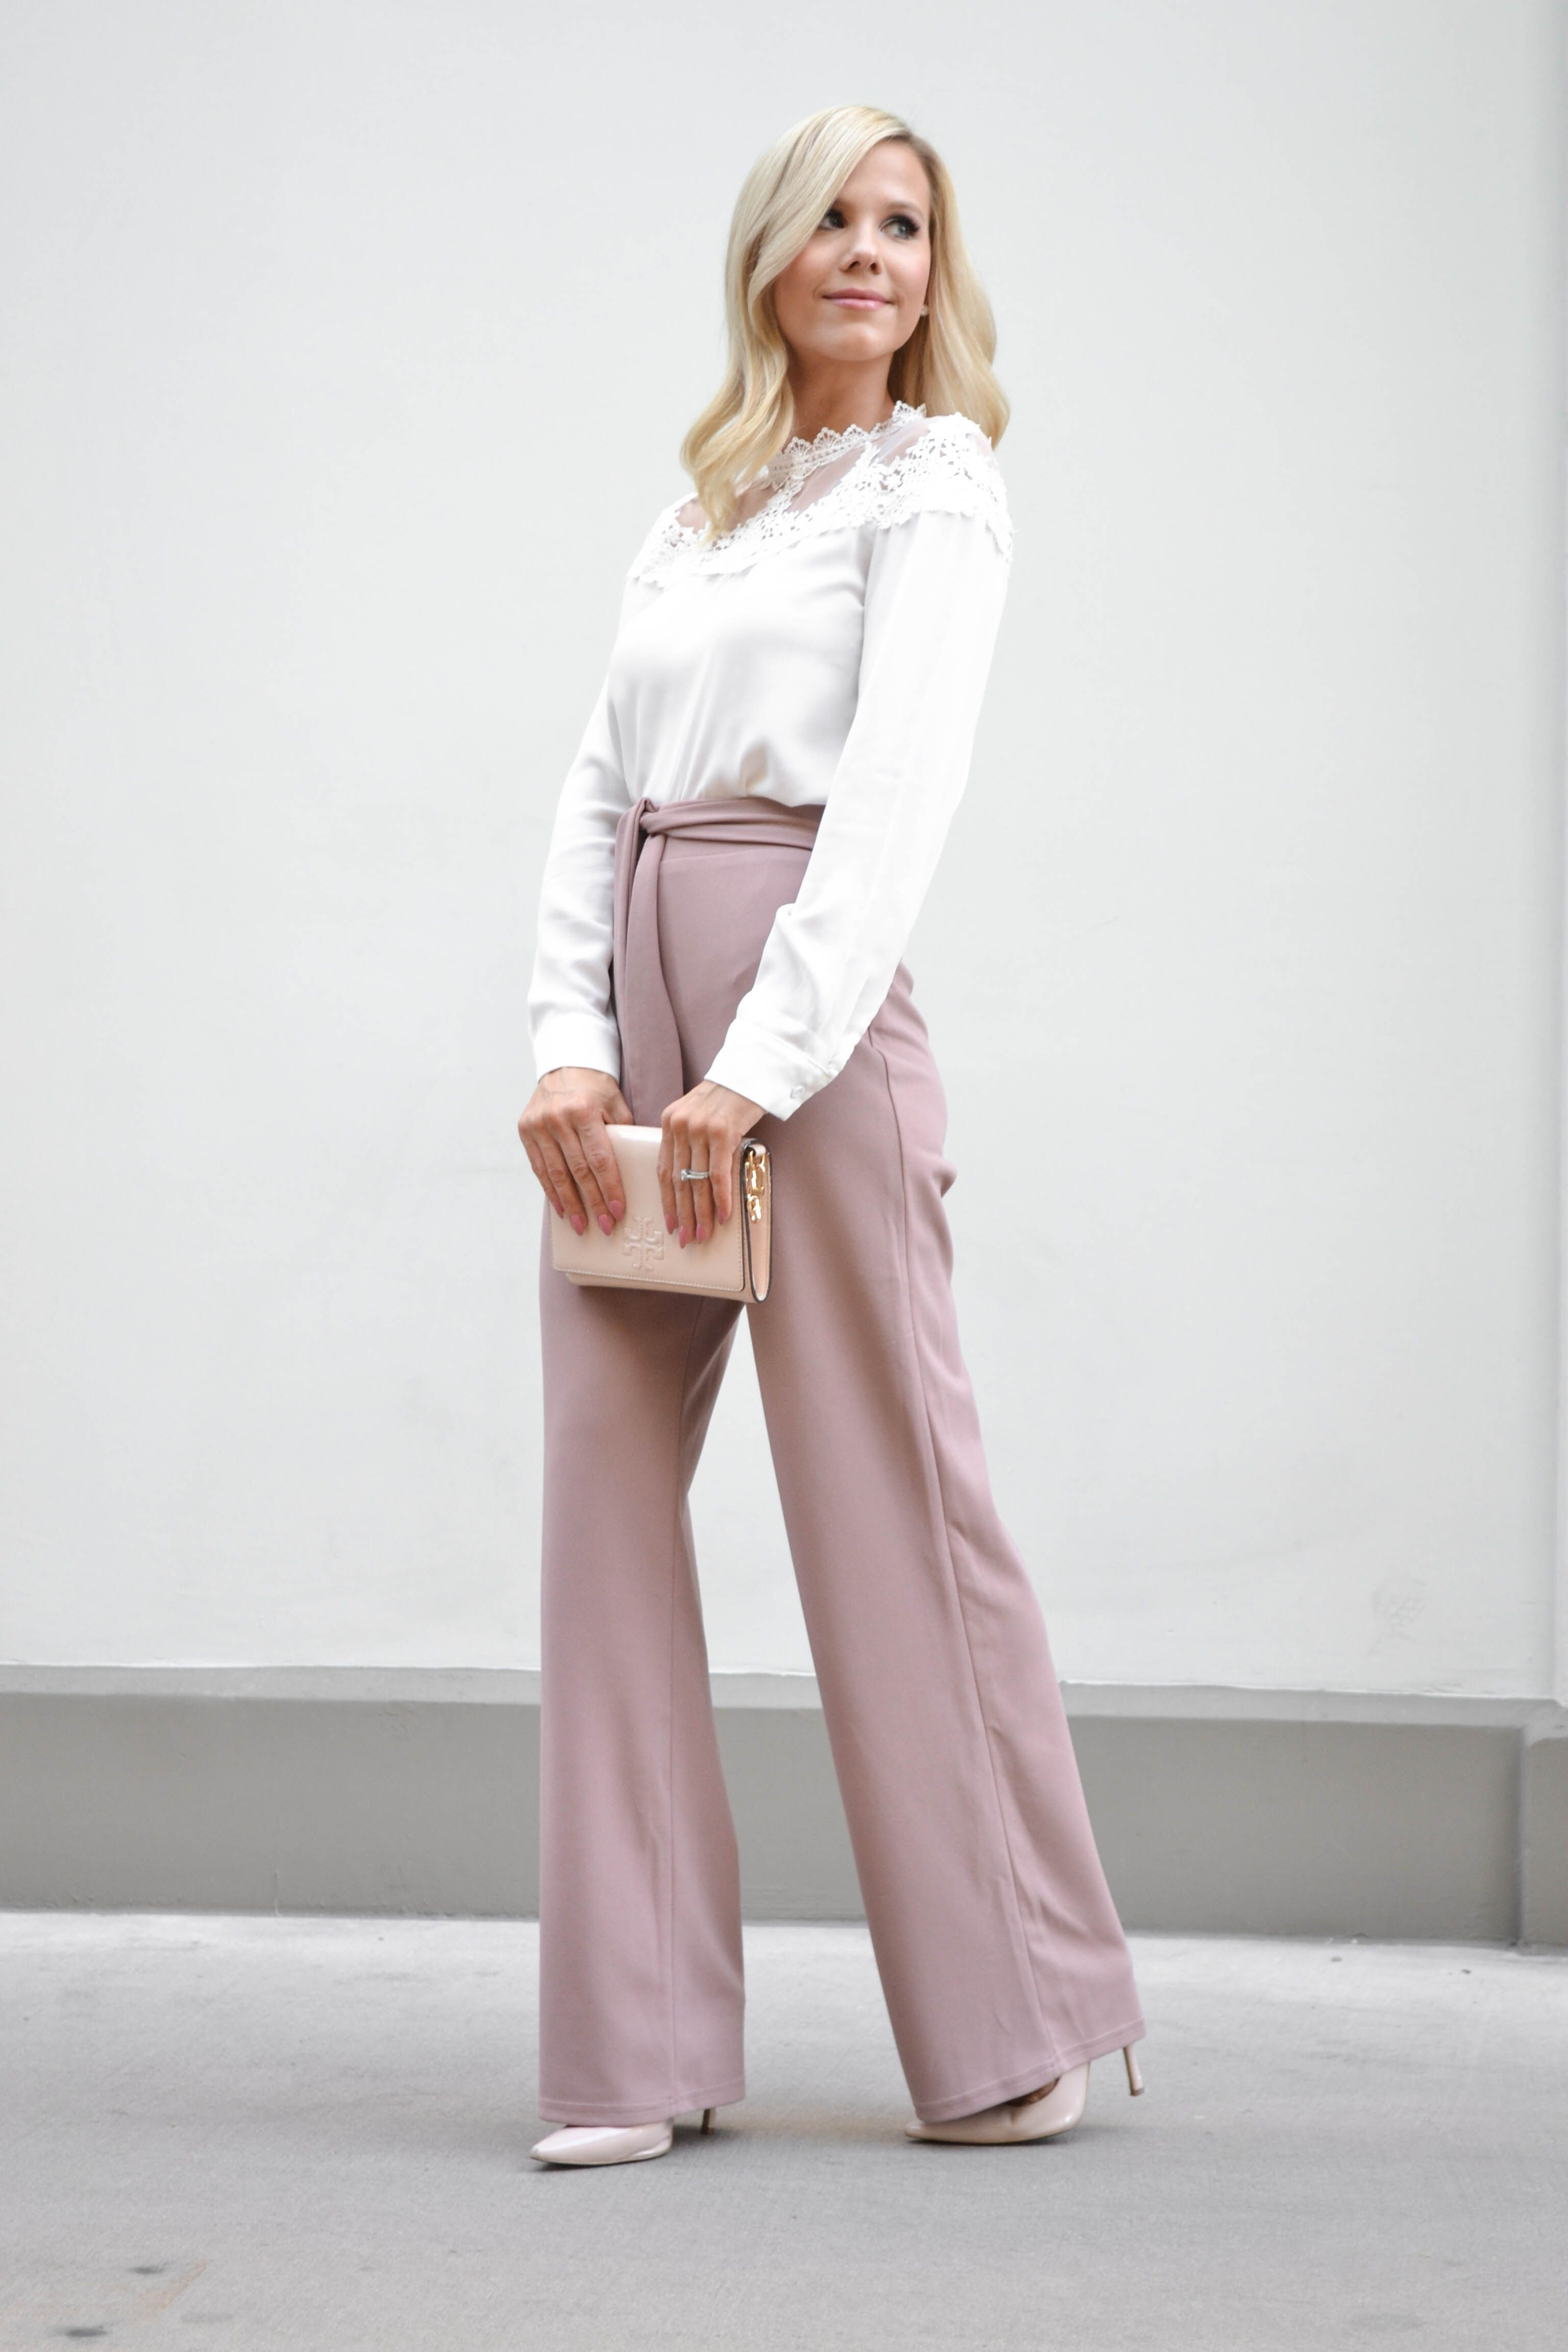 1f3b15a418 #SHEIN #Self #Tie #Waist #Palazzo #Pants #Pink #Elegant #High #Waist #Pants  #Autumn #Trousers #Women #Elastic #Waist #Casual #Pants